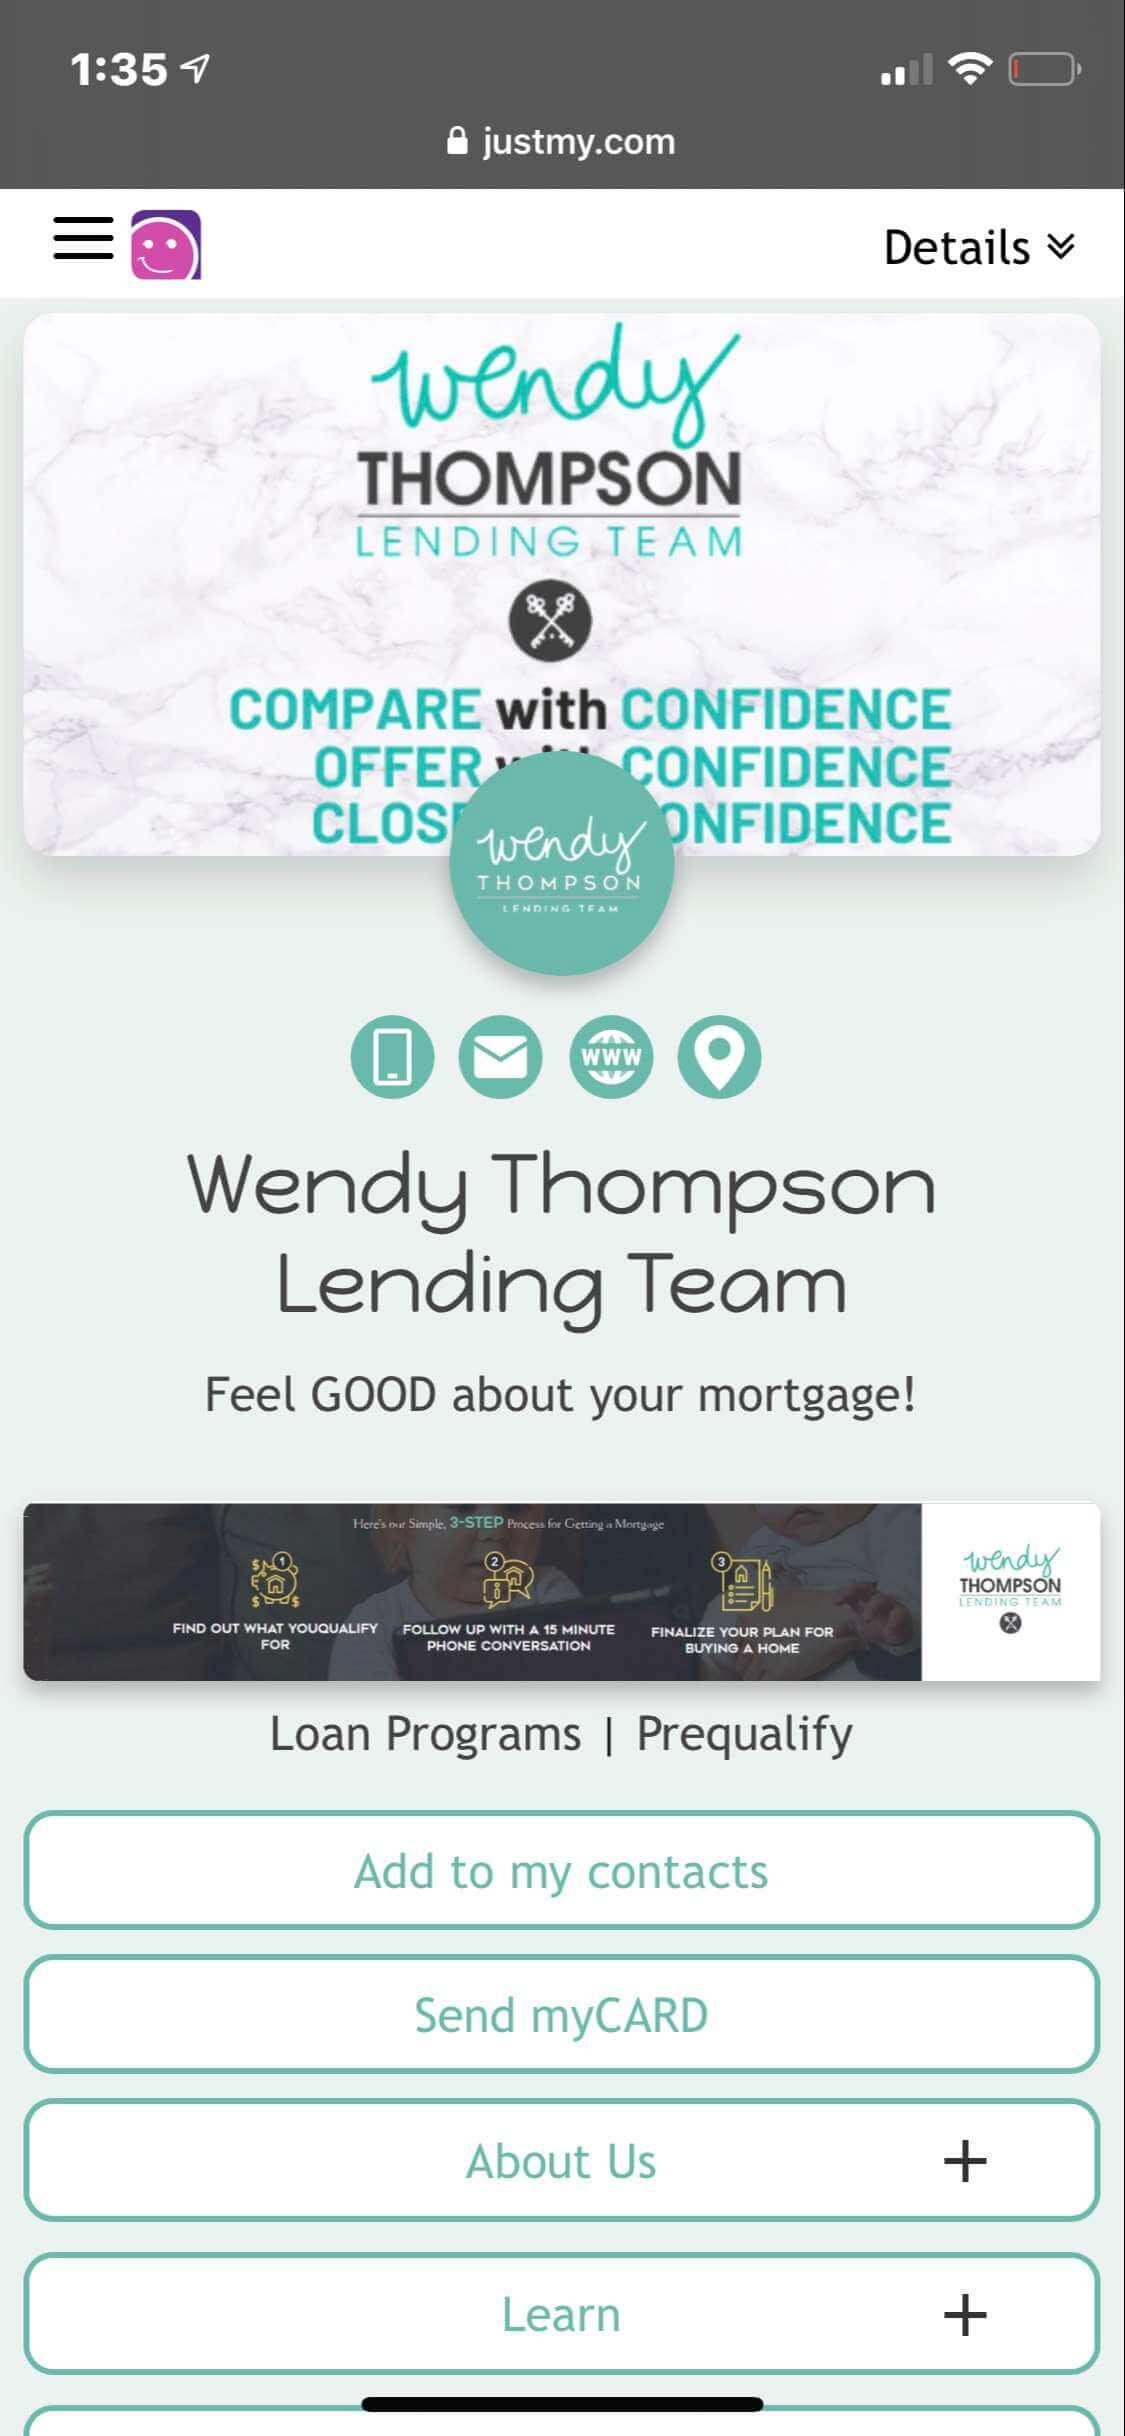 myCARD  |  Wendy Thompson Lending Team